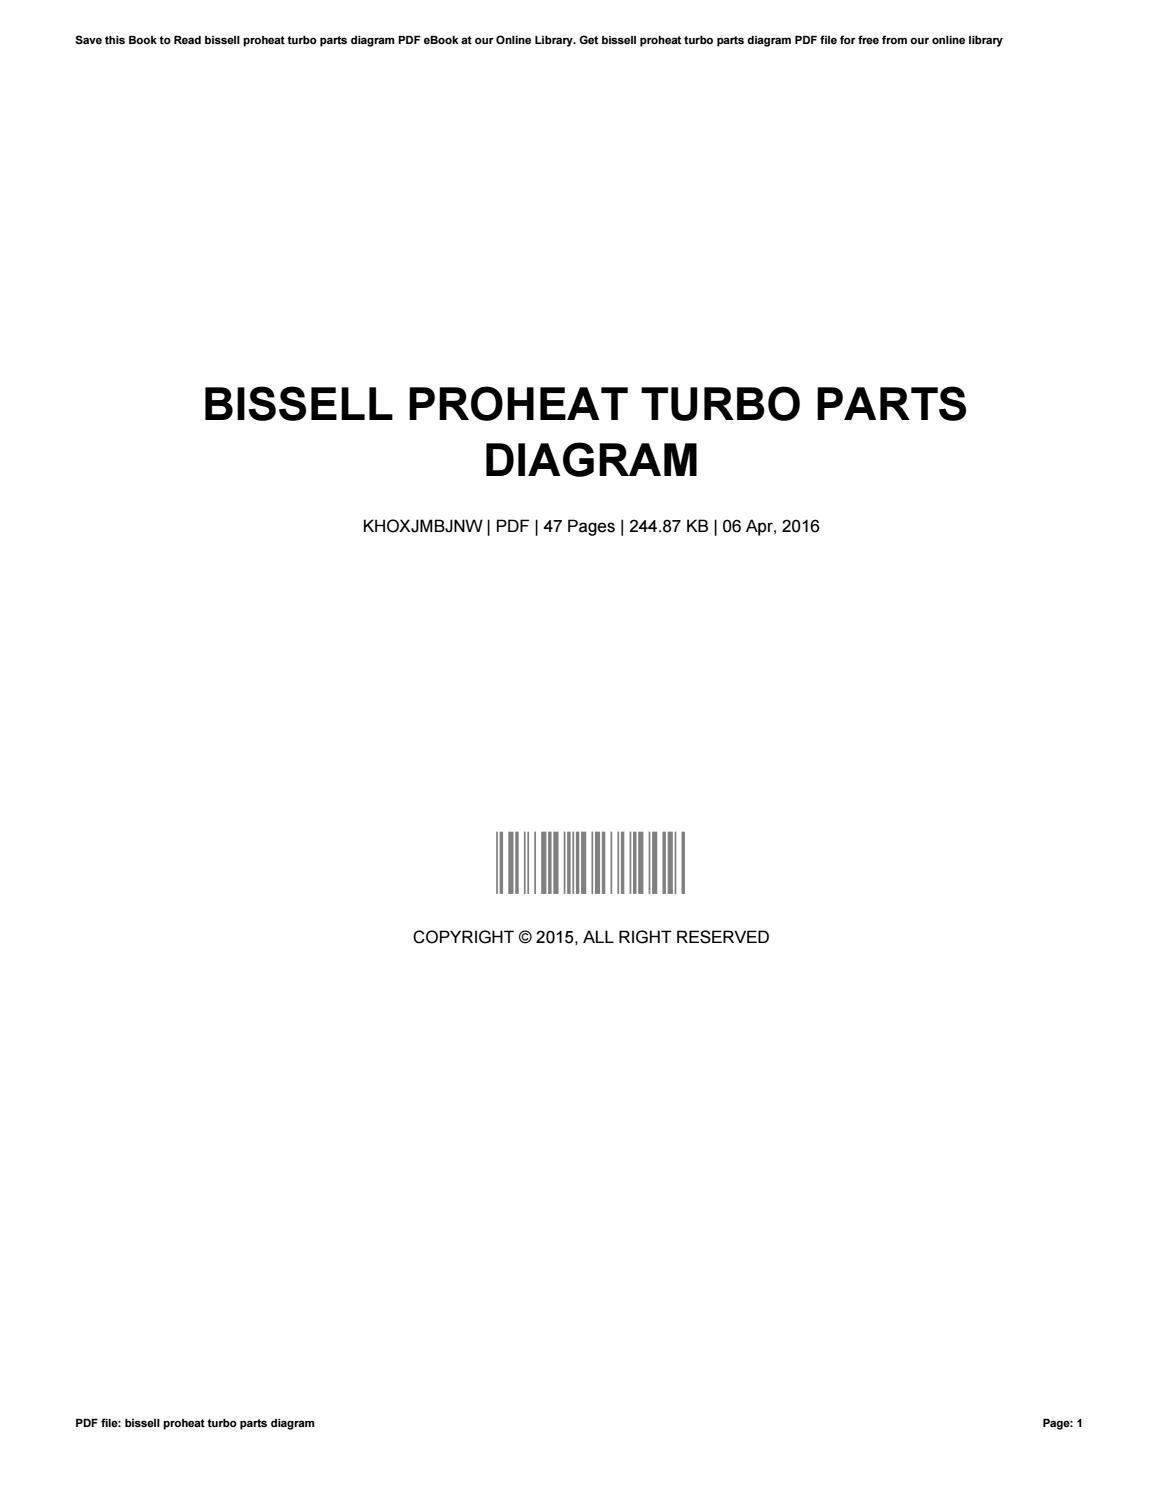 Bissell proheat turbo parts diagram by robertsorensen4116 issuu pooptronica